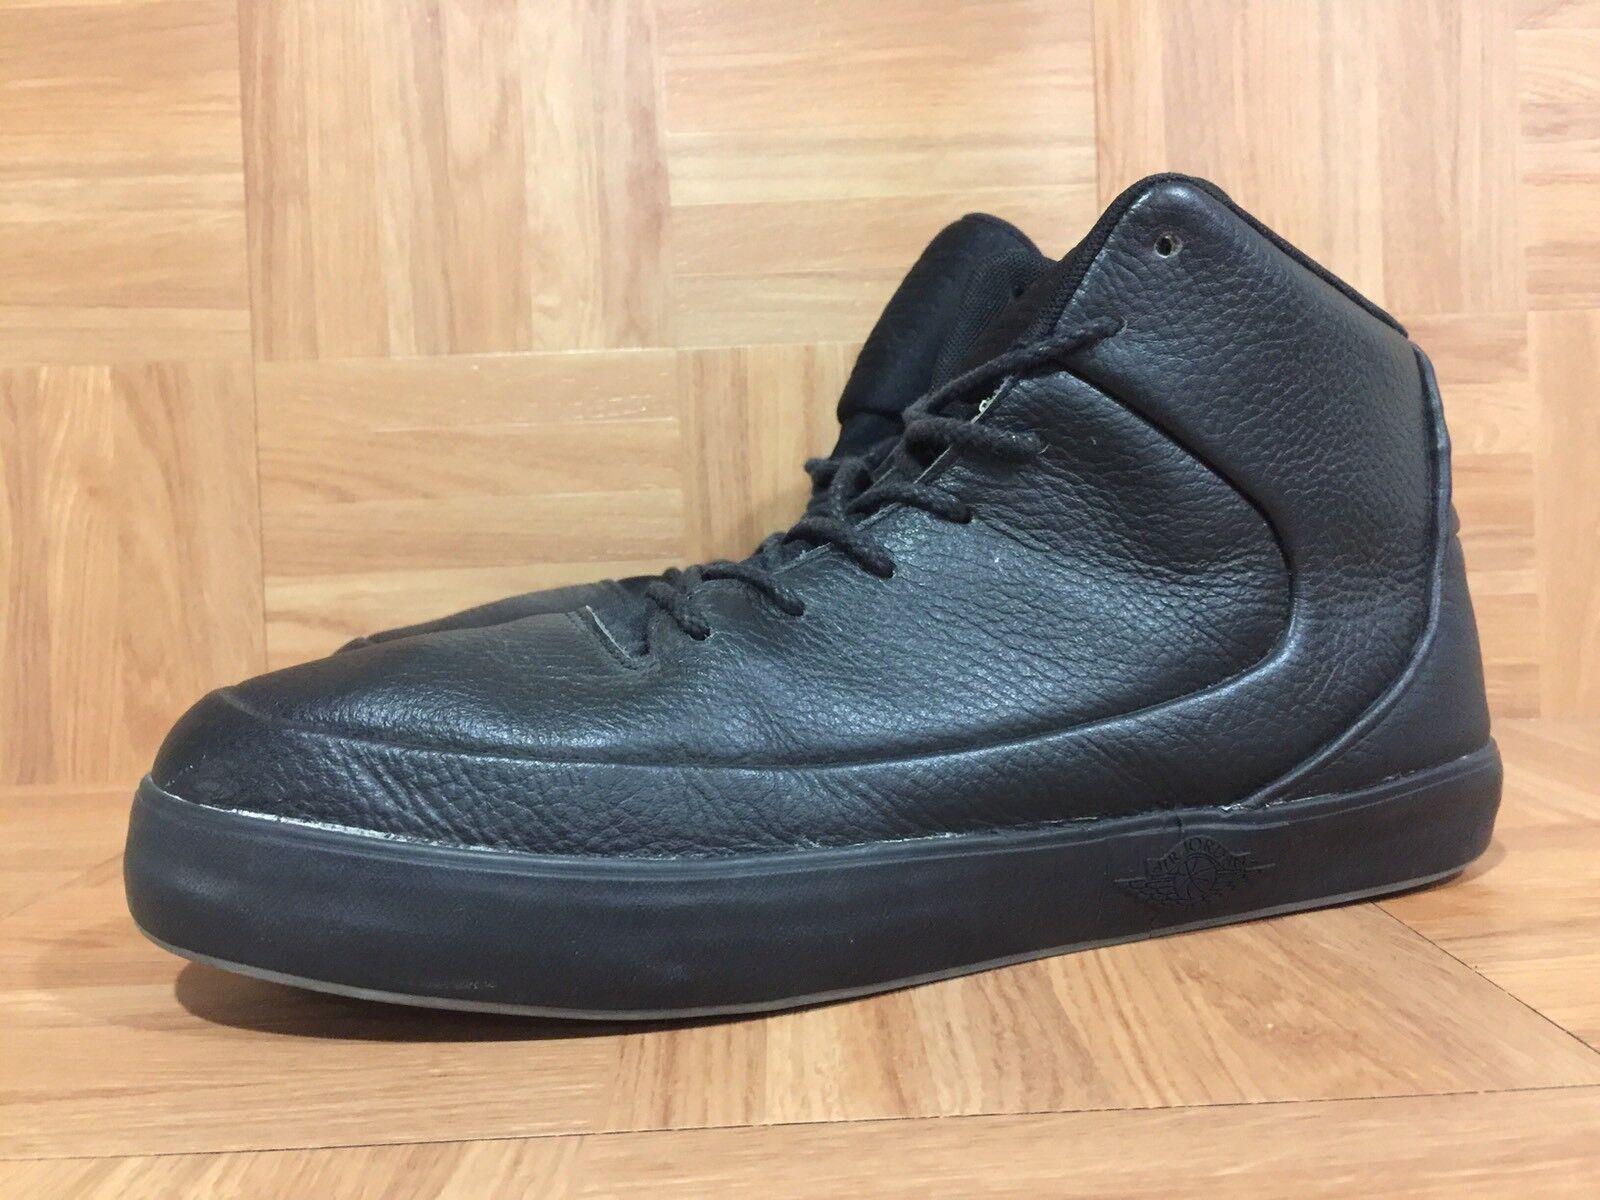 21dd186c734ee7 ... RARE Nike Air Jordan Jordan Jordan V.9 Grown Mid Black Leather shoes Sz  10 ...